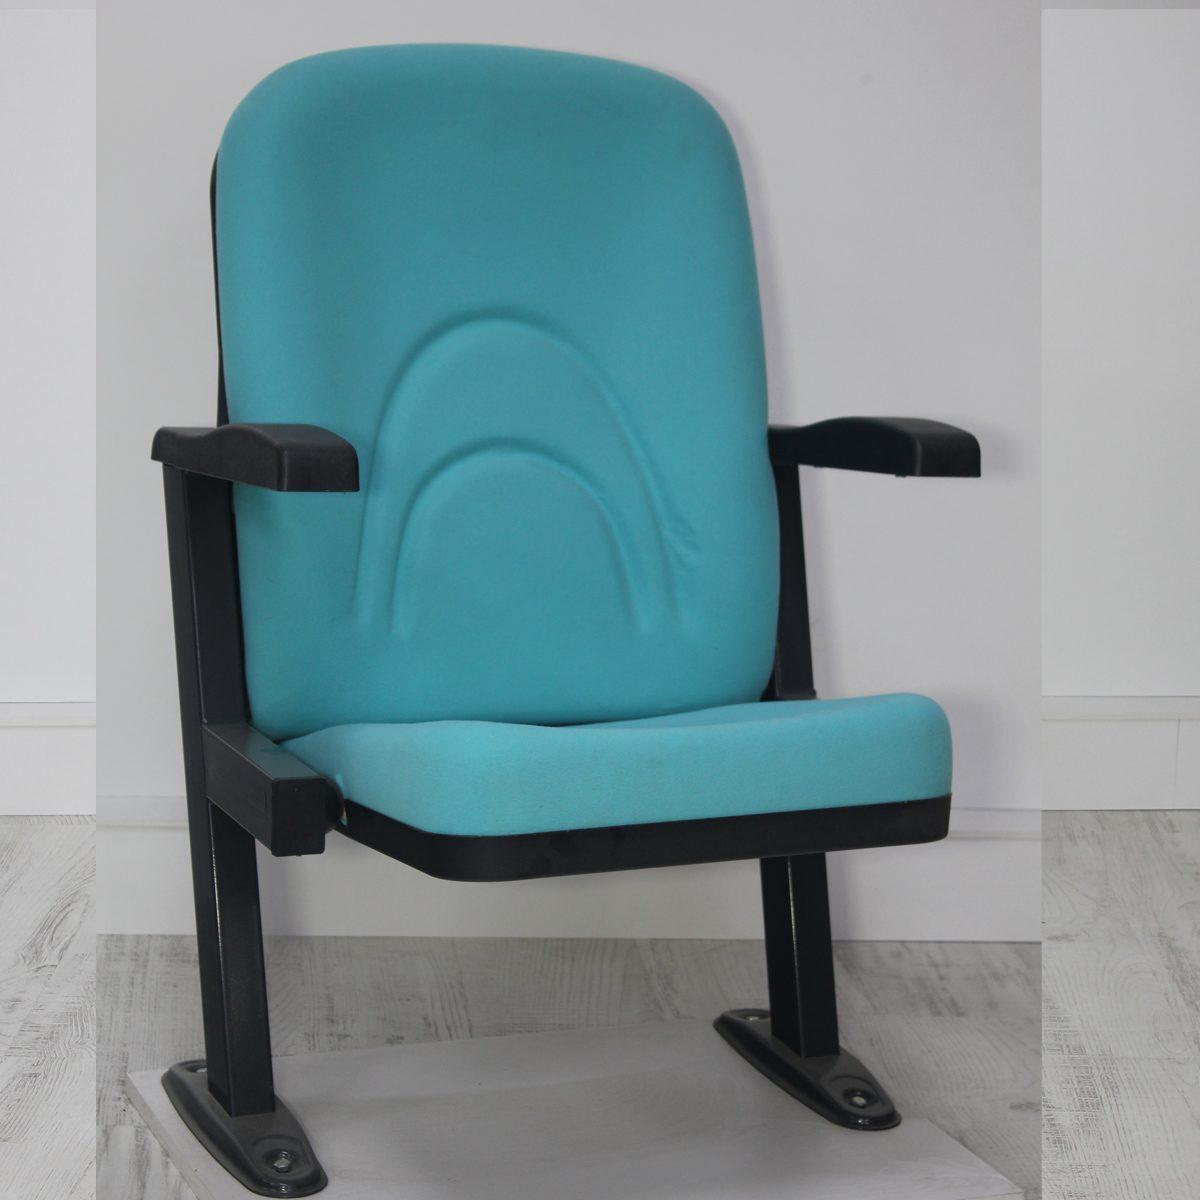 okul konferans sandalyesi